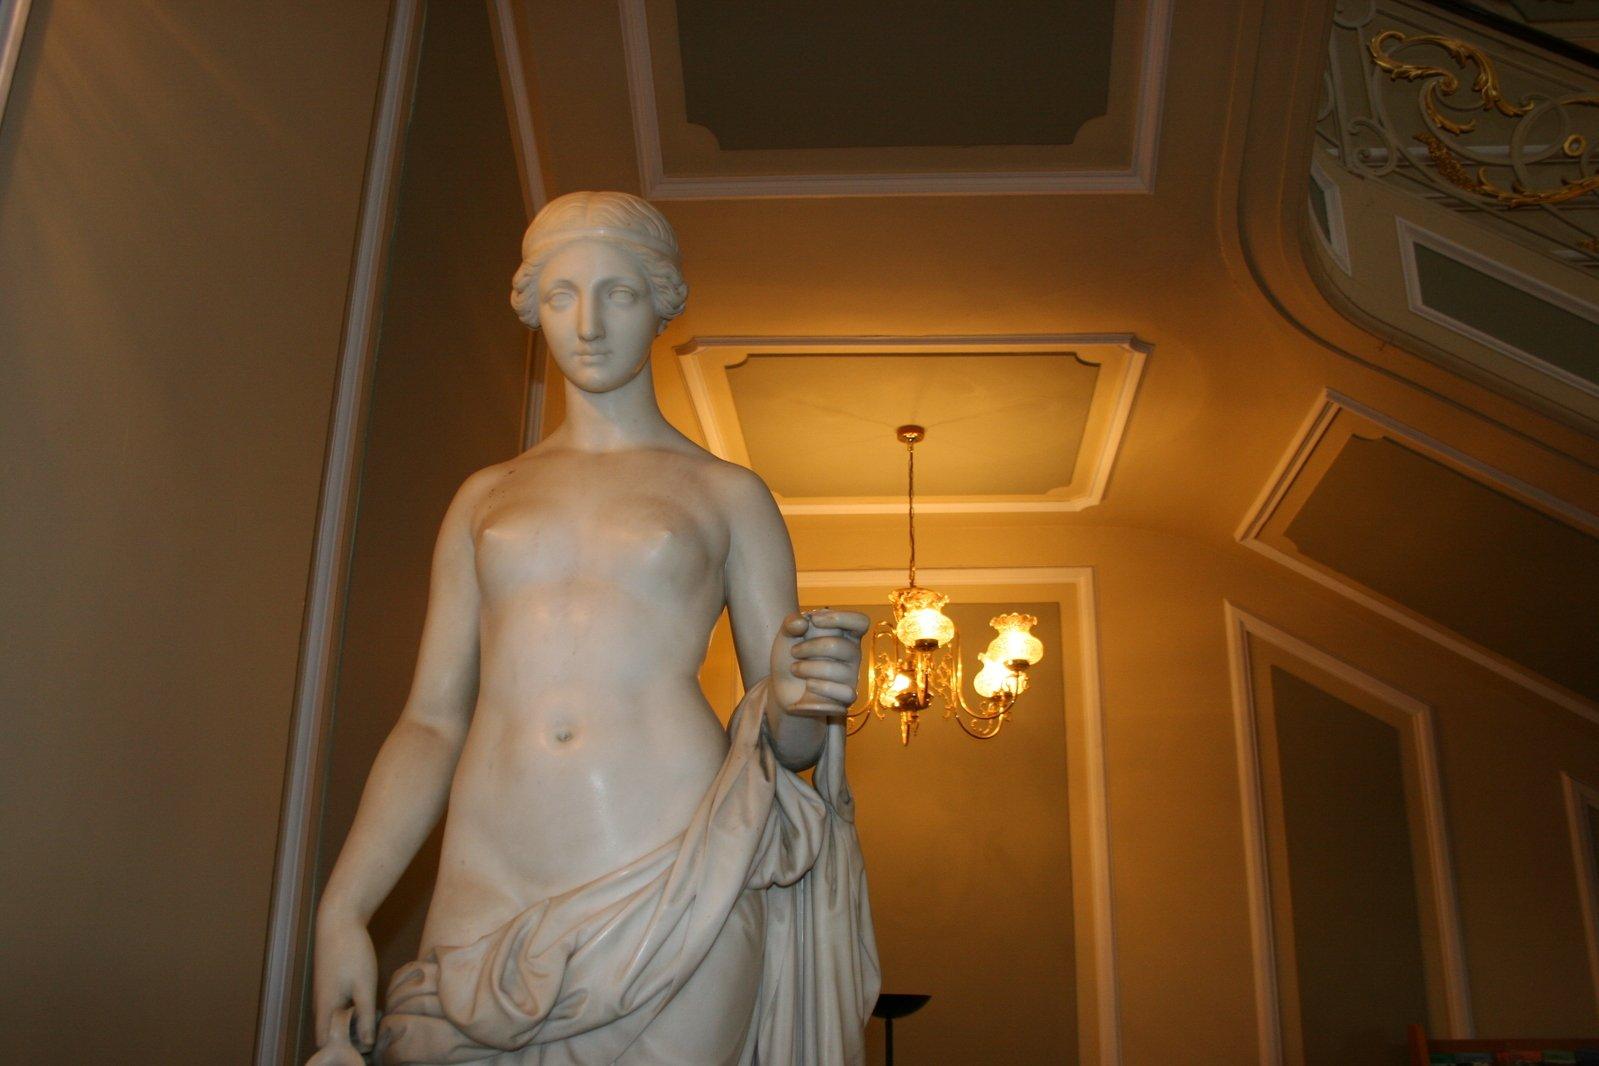 Statue,statue,ornament,internal